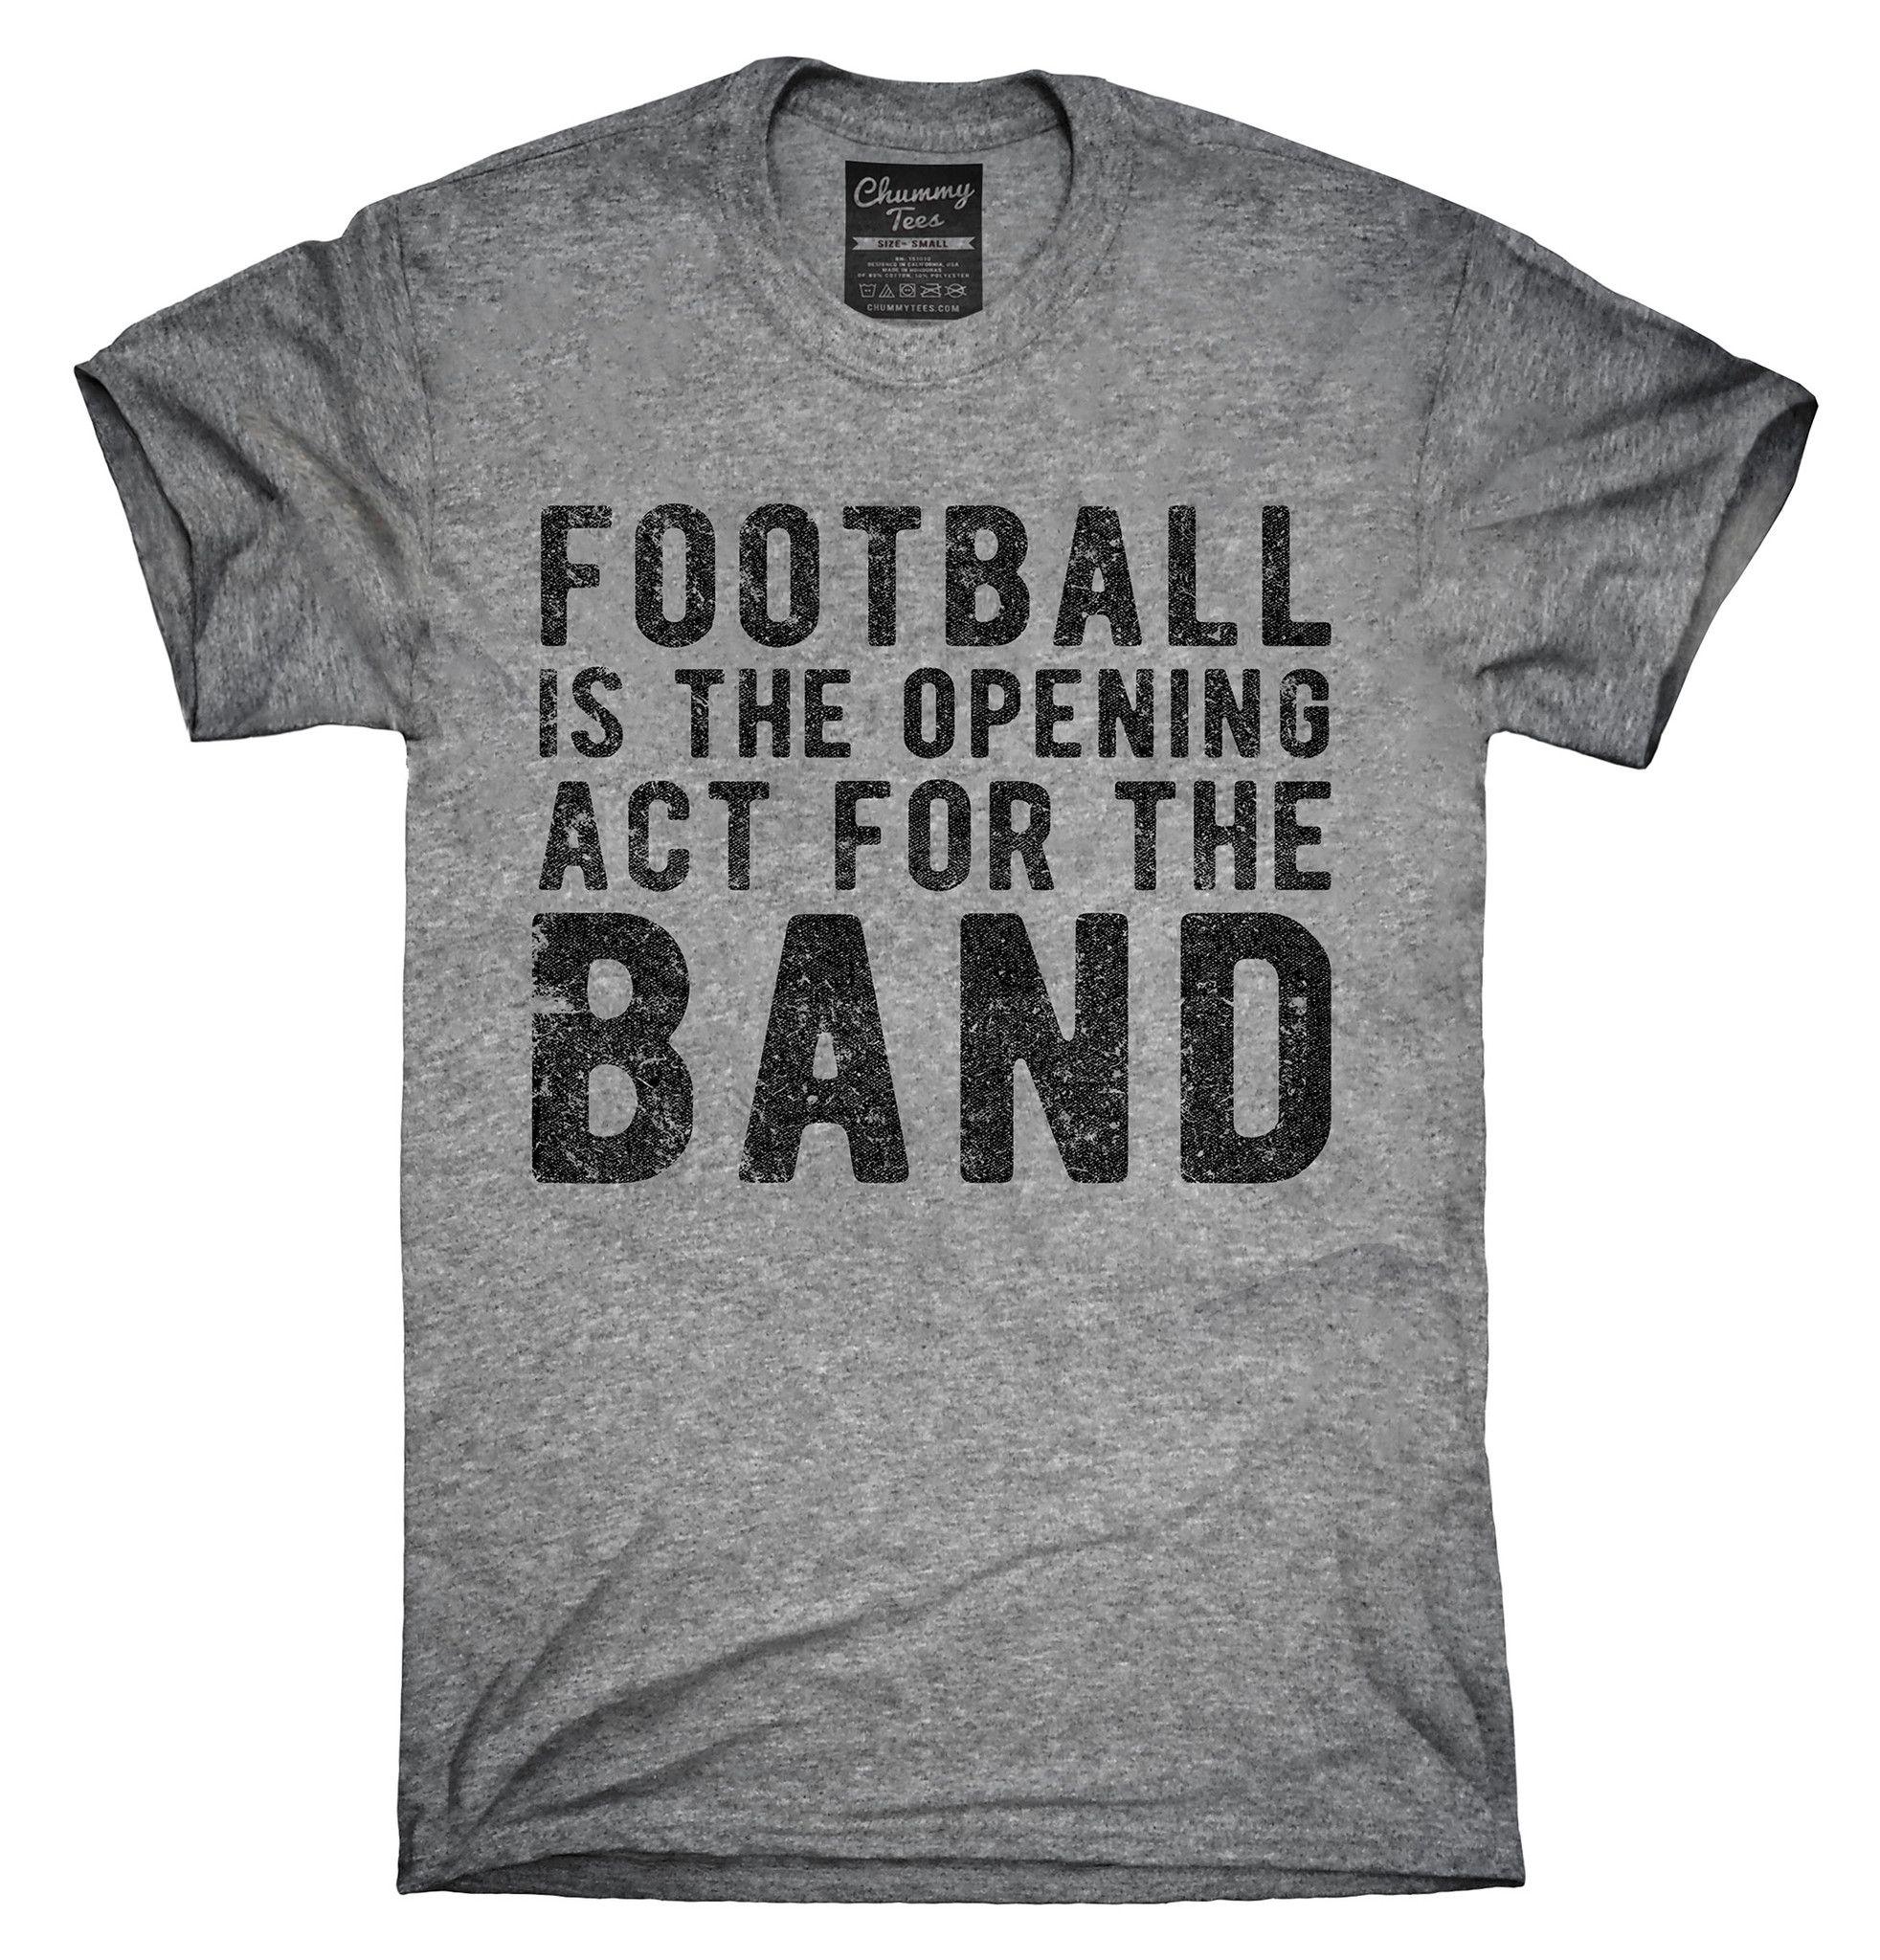 Funny Marching Band Shirt, Hoodies, Tanktops